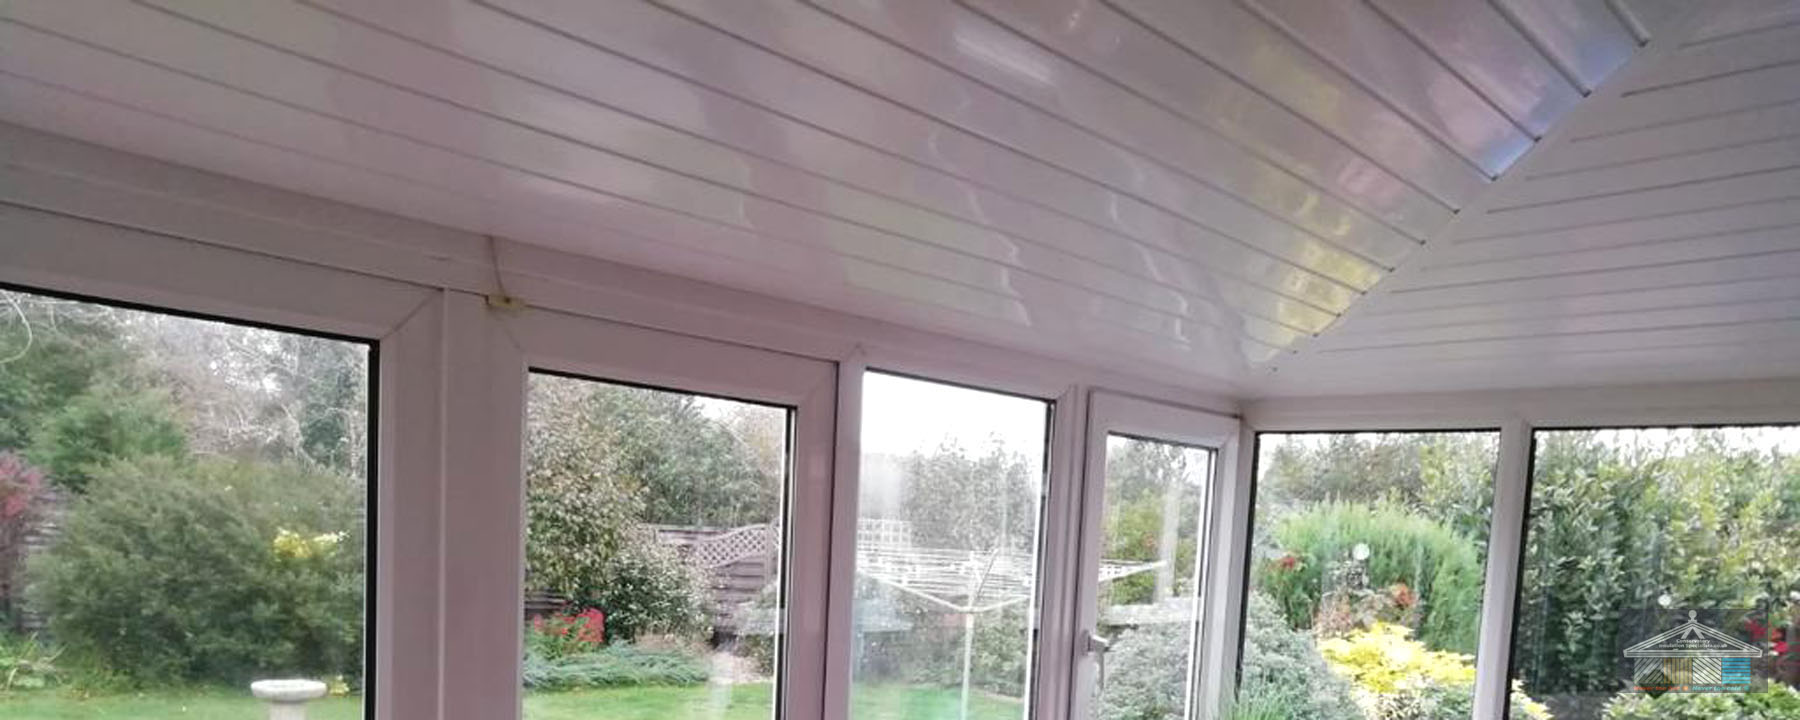 New conservatory roof interior